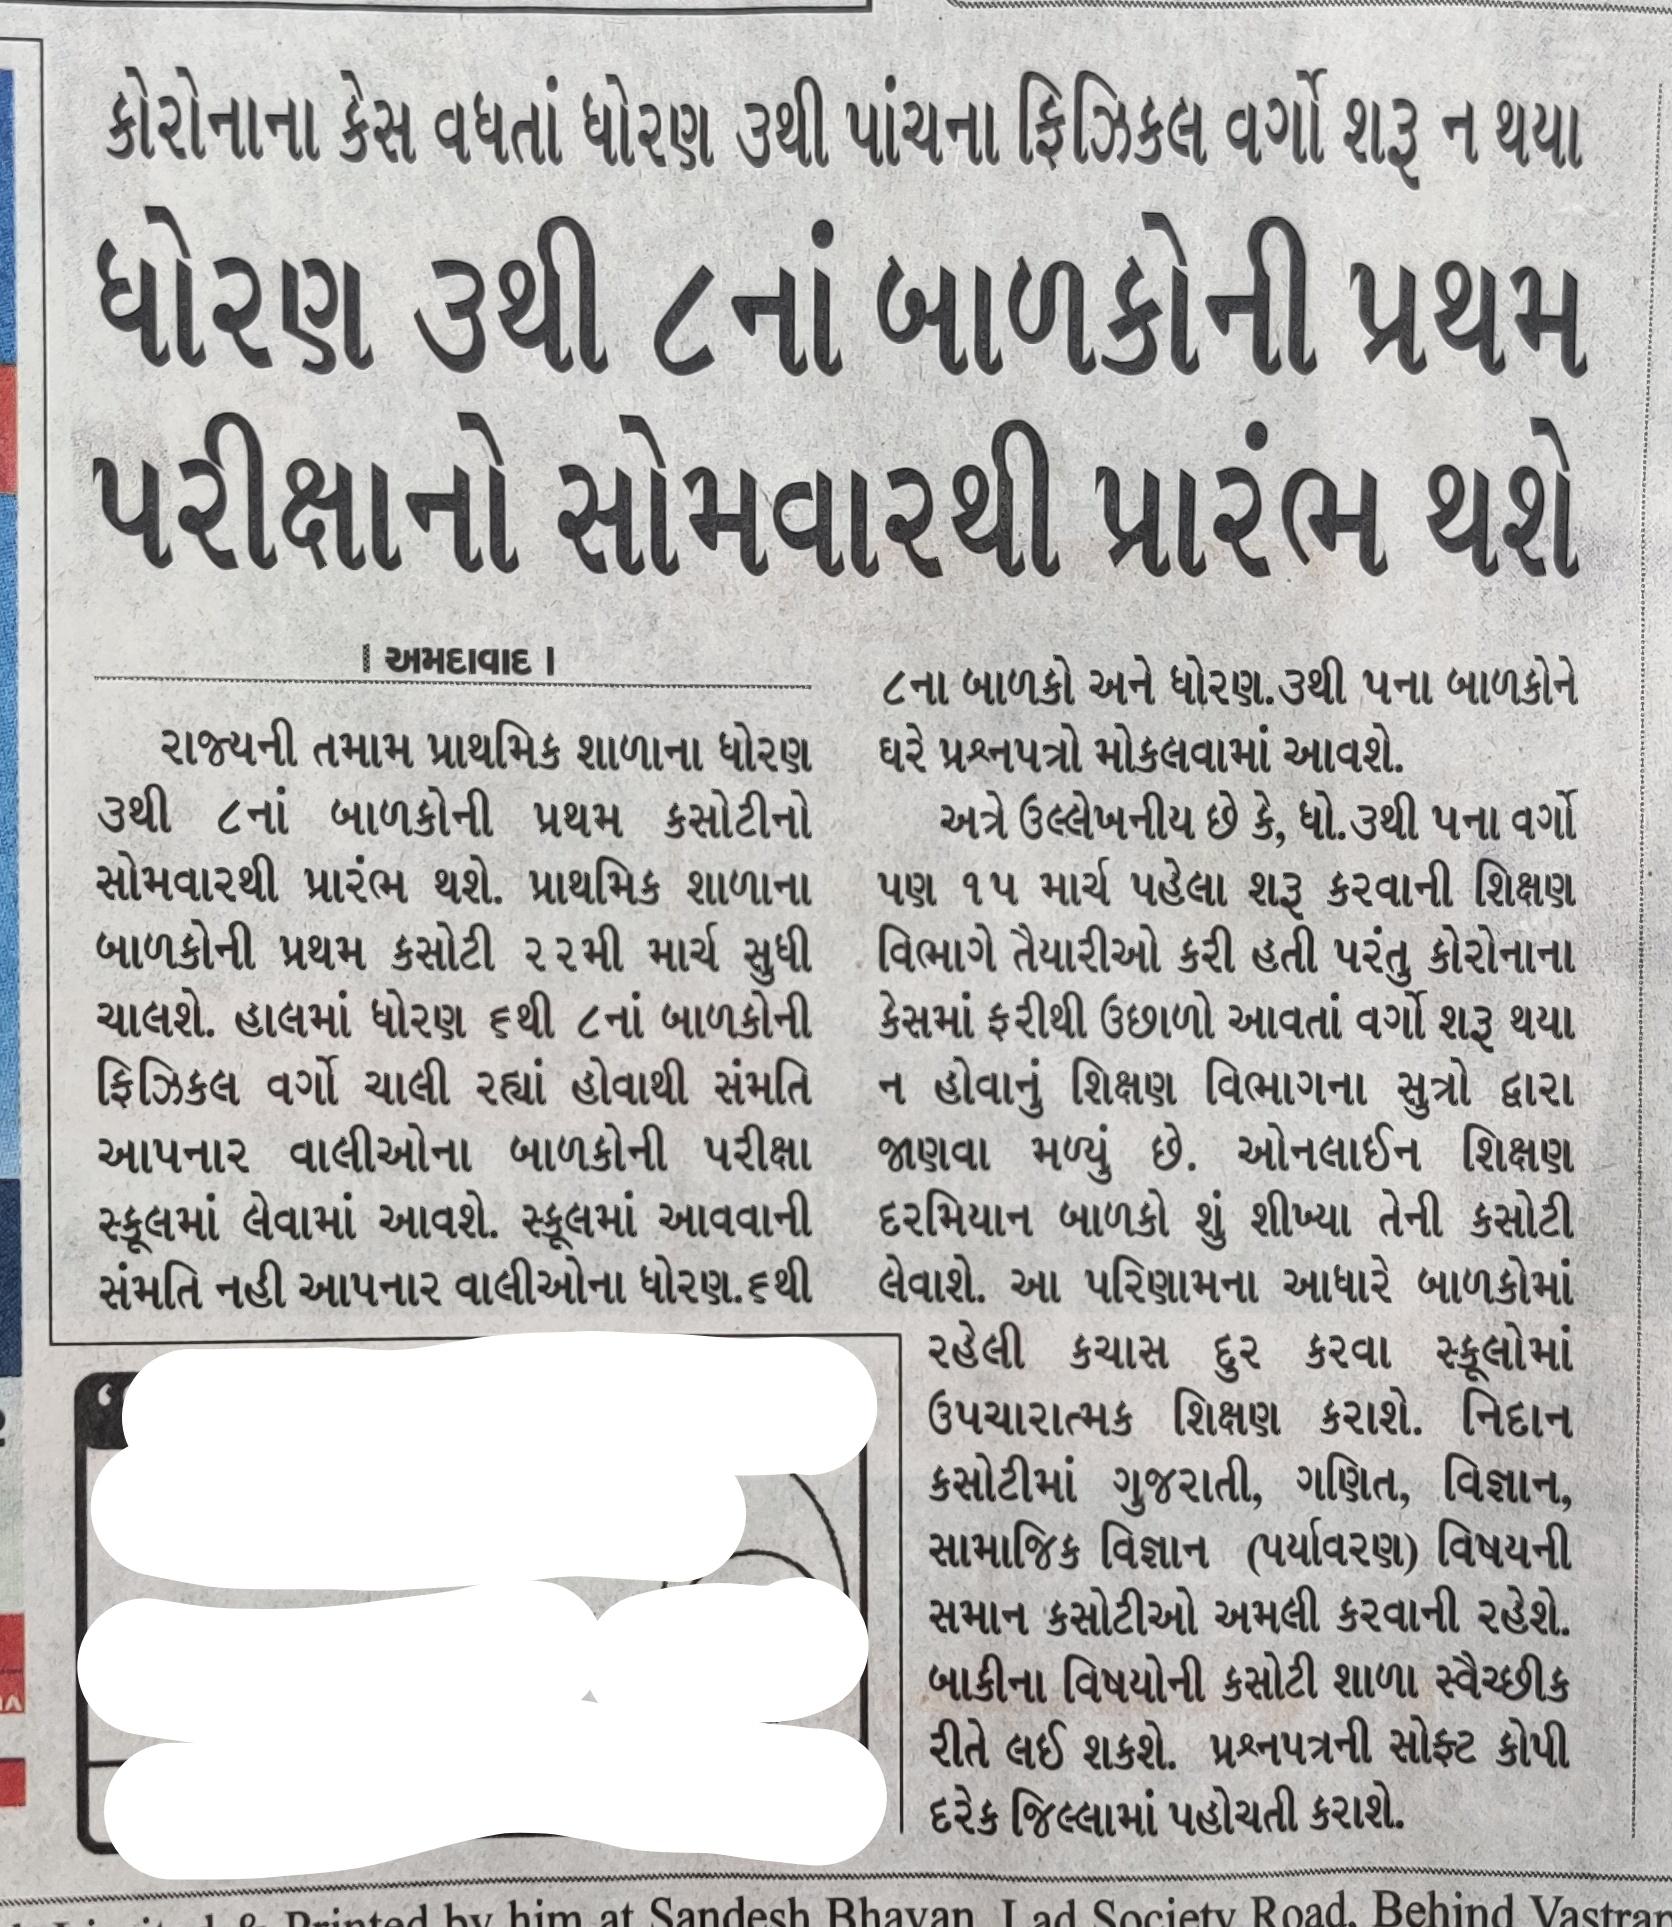 http://www.pravinvankar.in/2021/03/the-first-examination-of-children-of.html